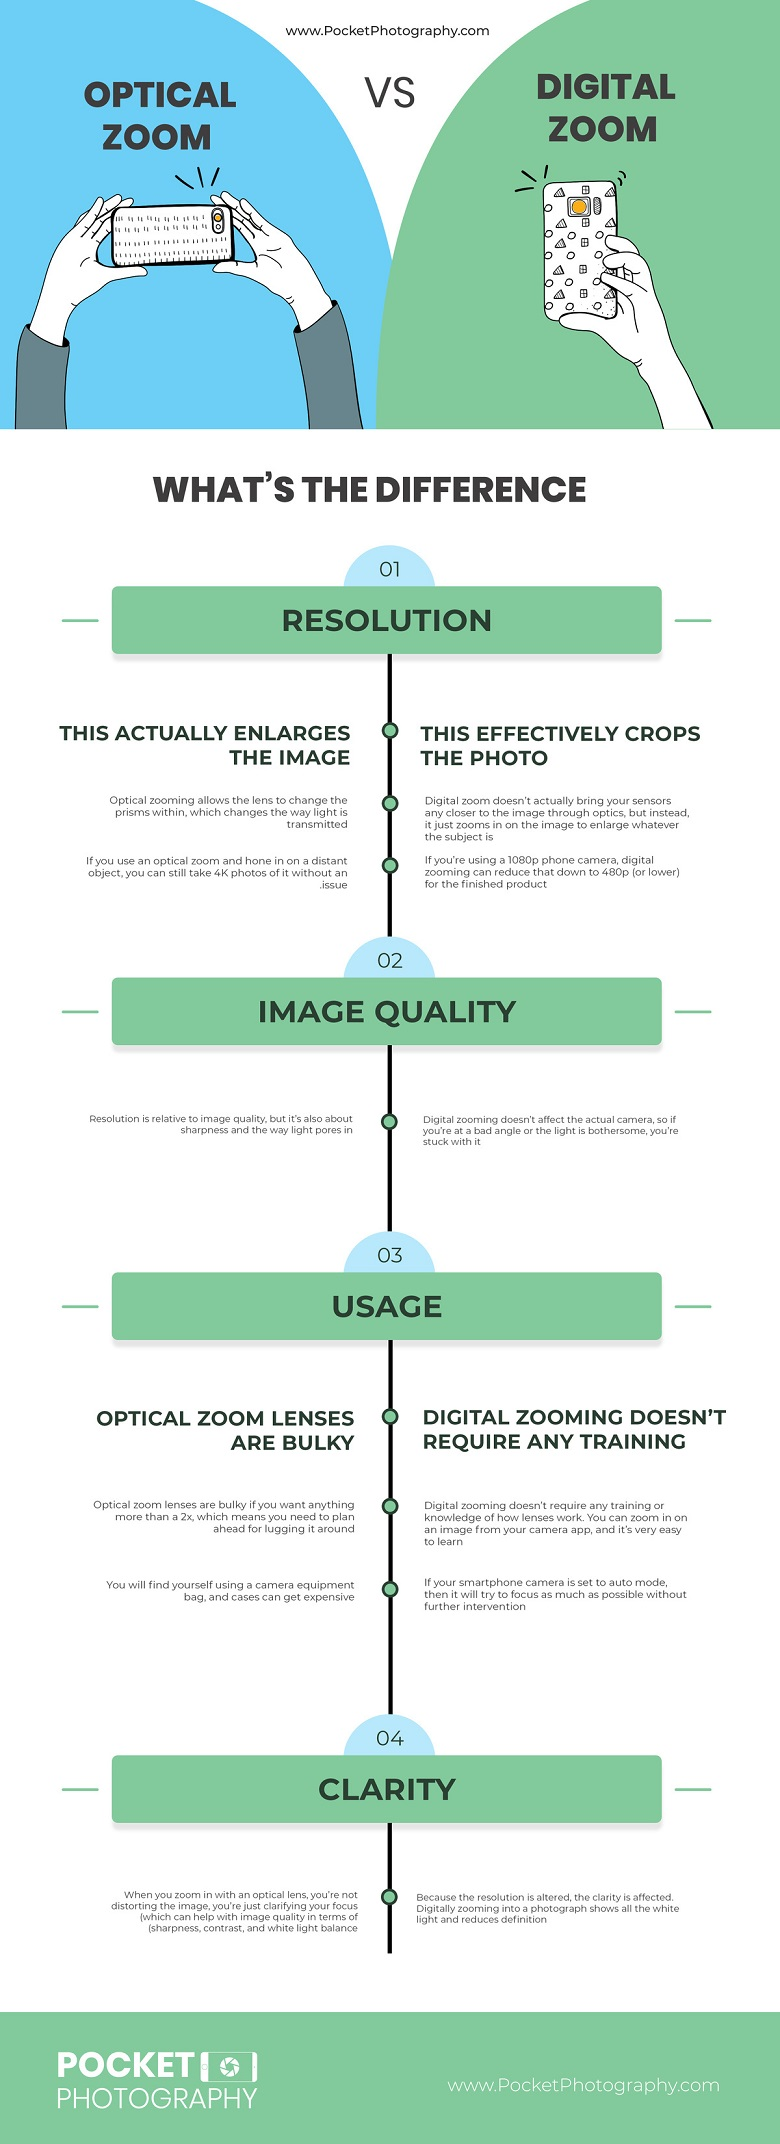 Optical vs. Digital Zoom